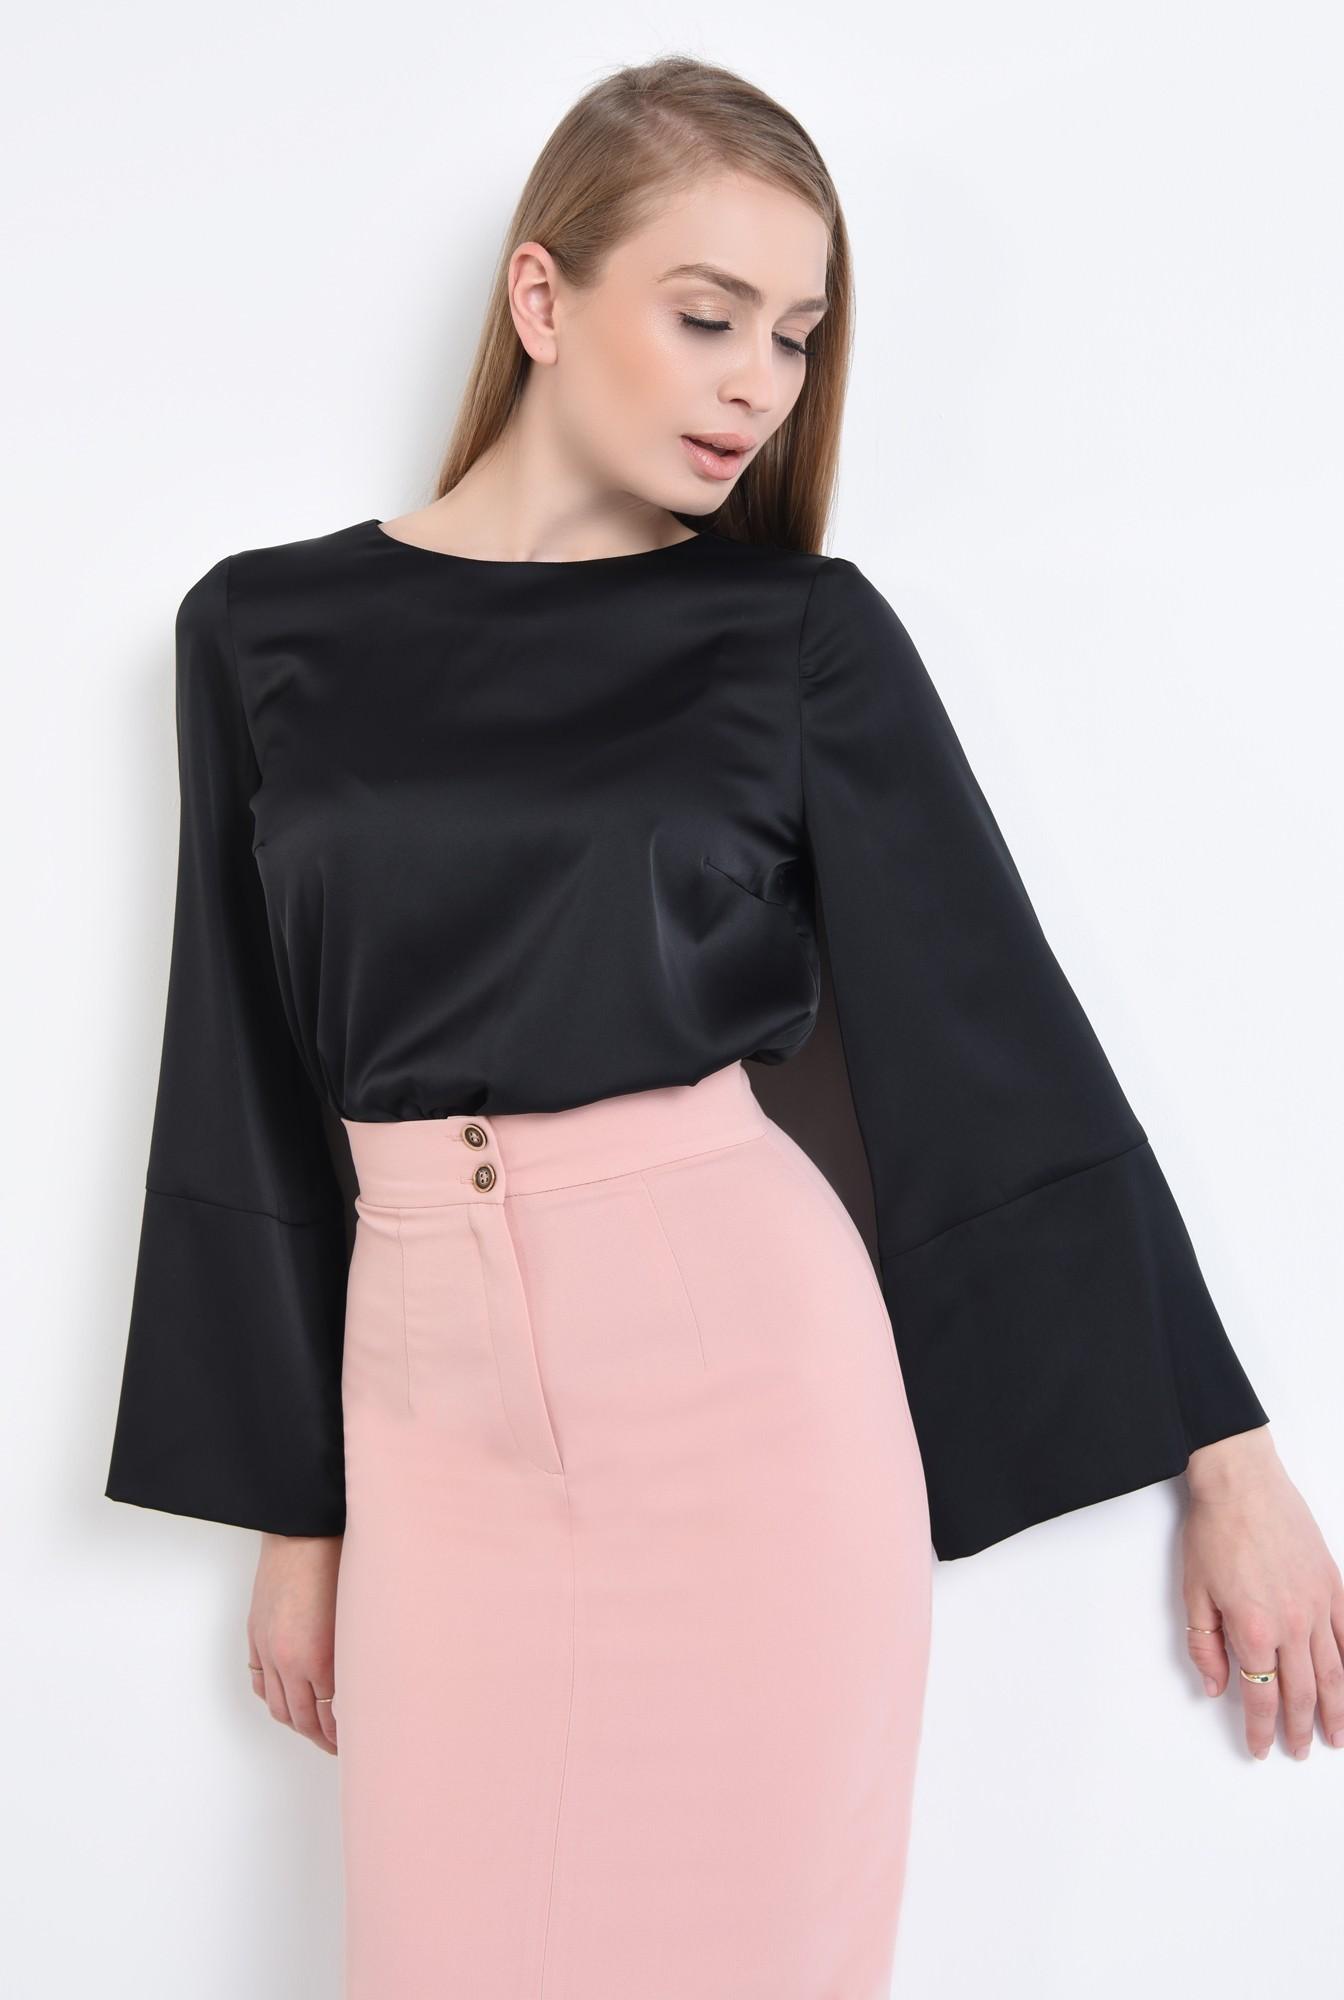 0 - 360 - Bluza casual neagra, mansete, decolteu rotund